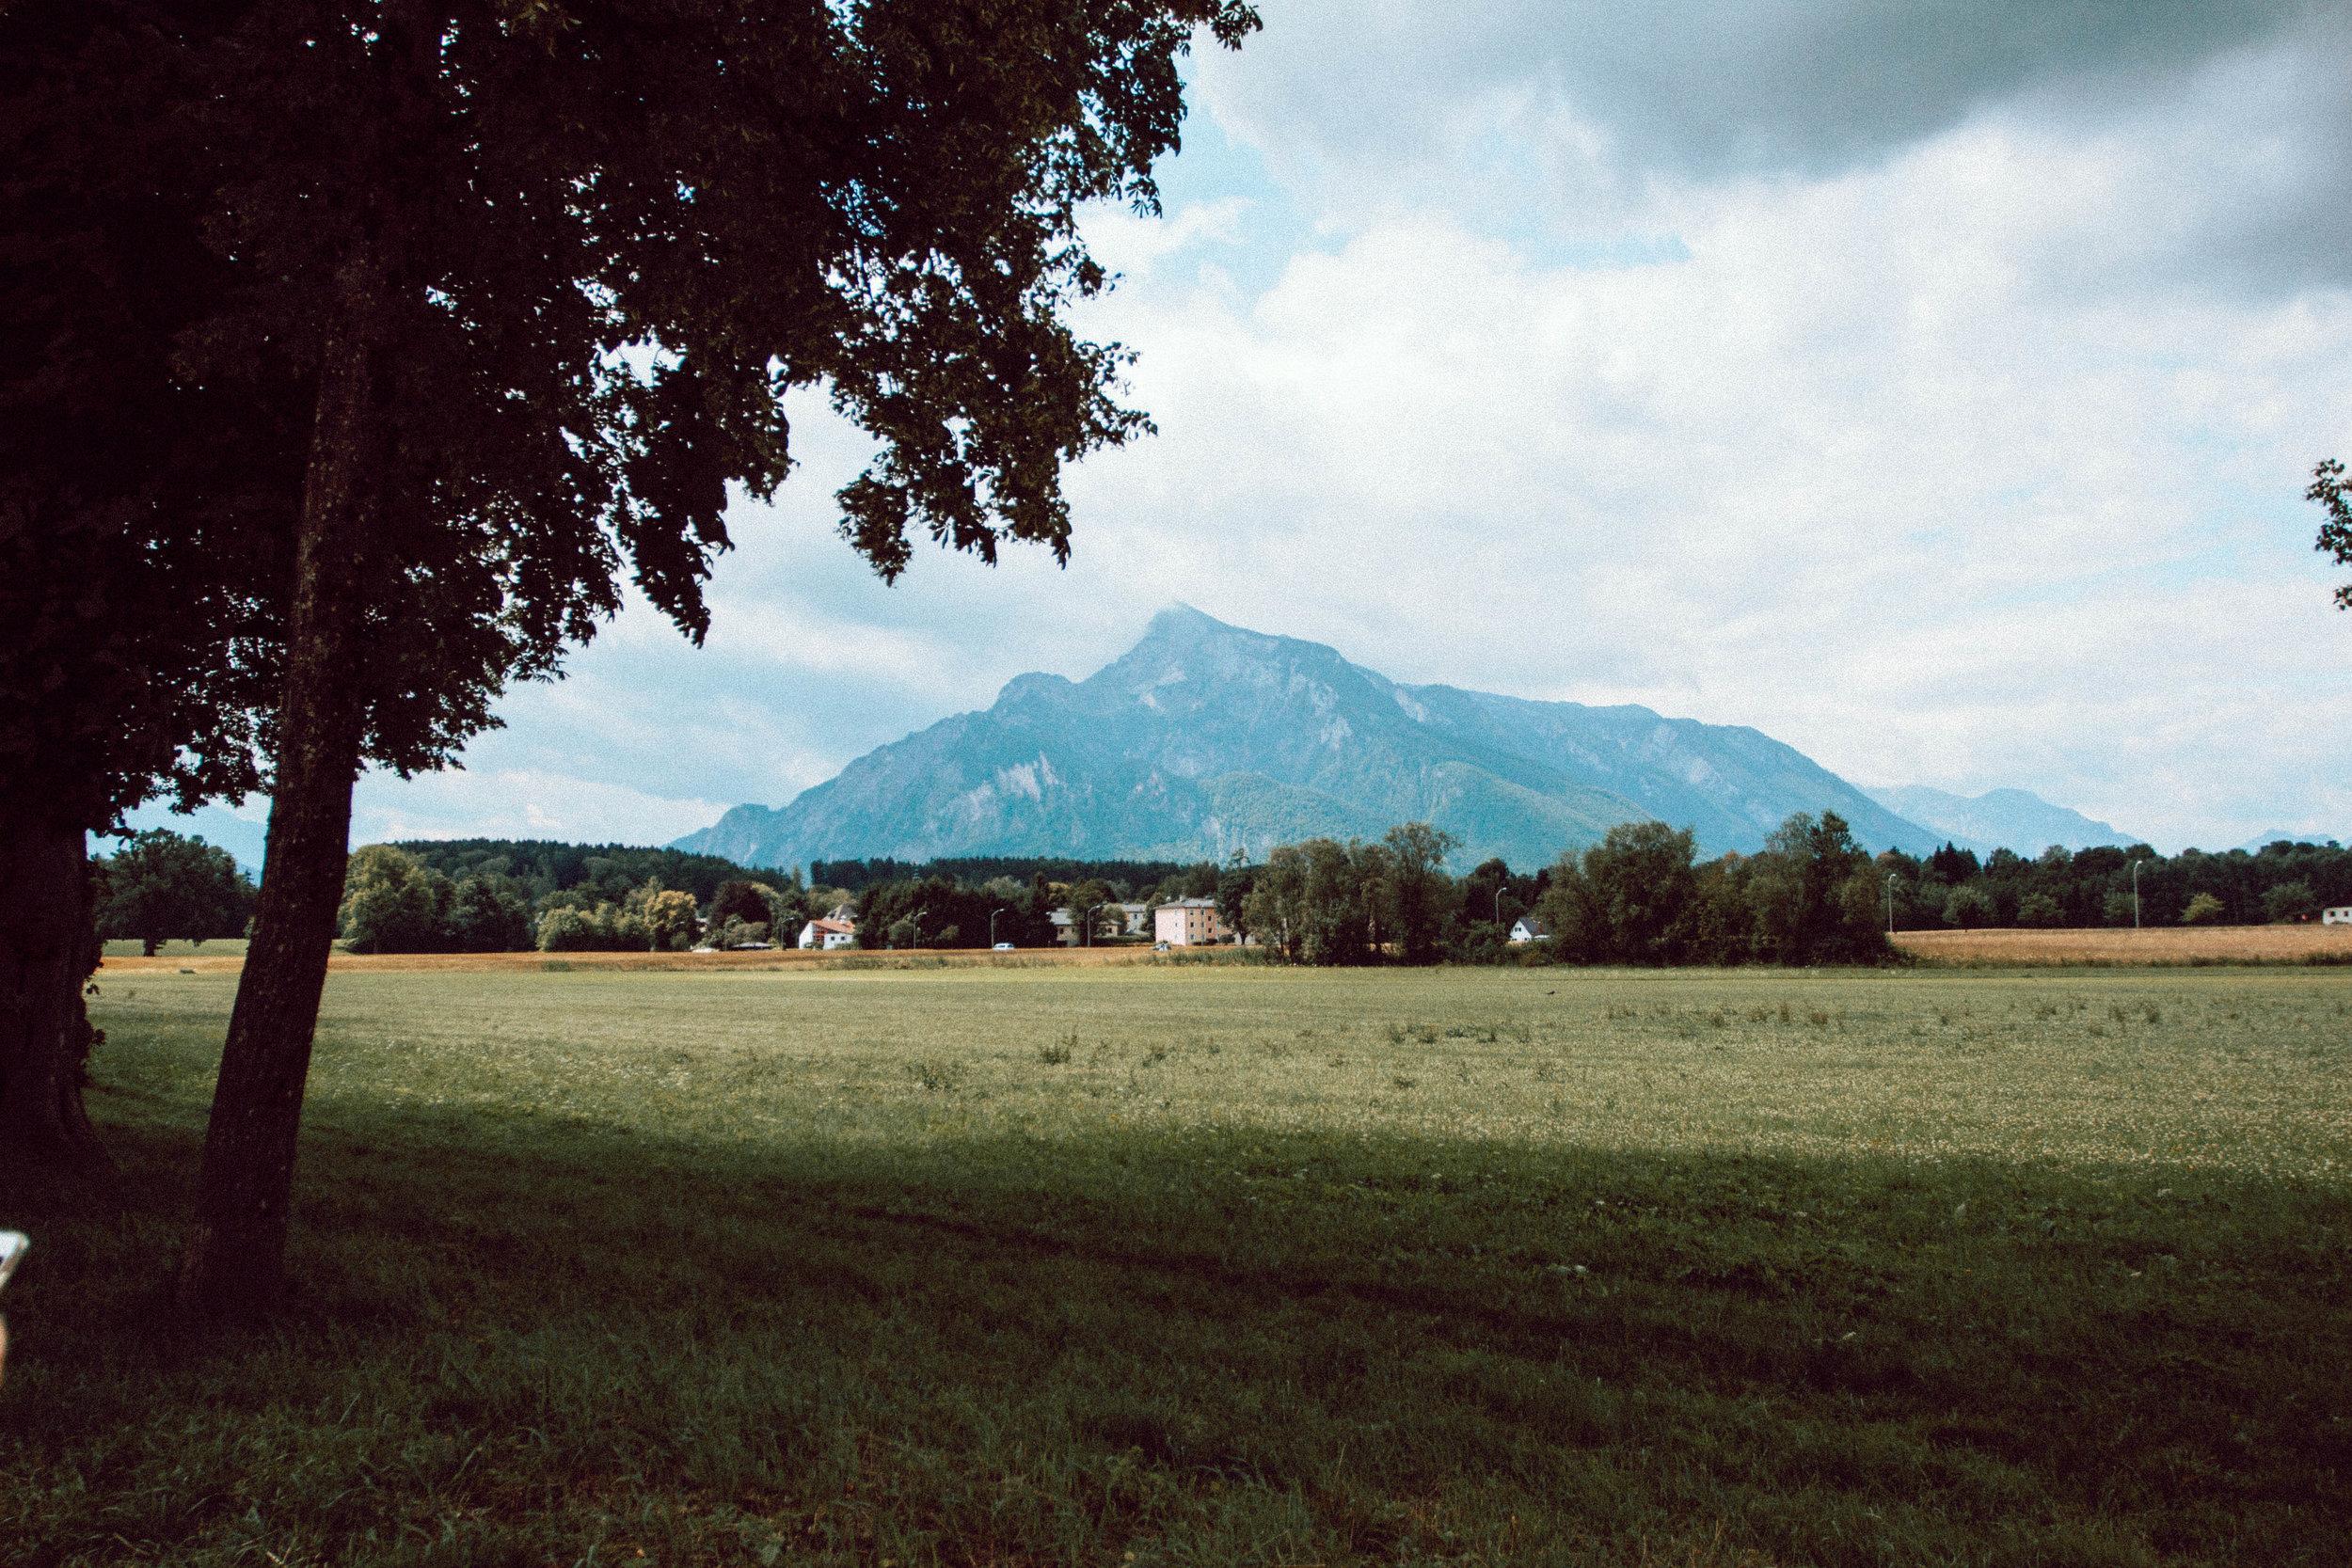 salzburg_june18-20.jpg